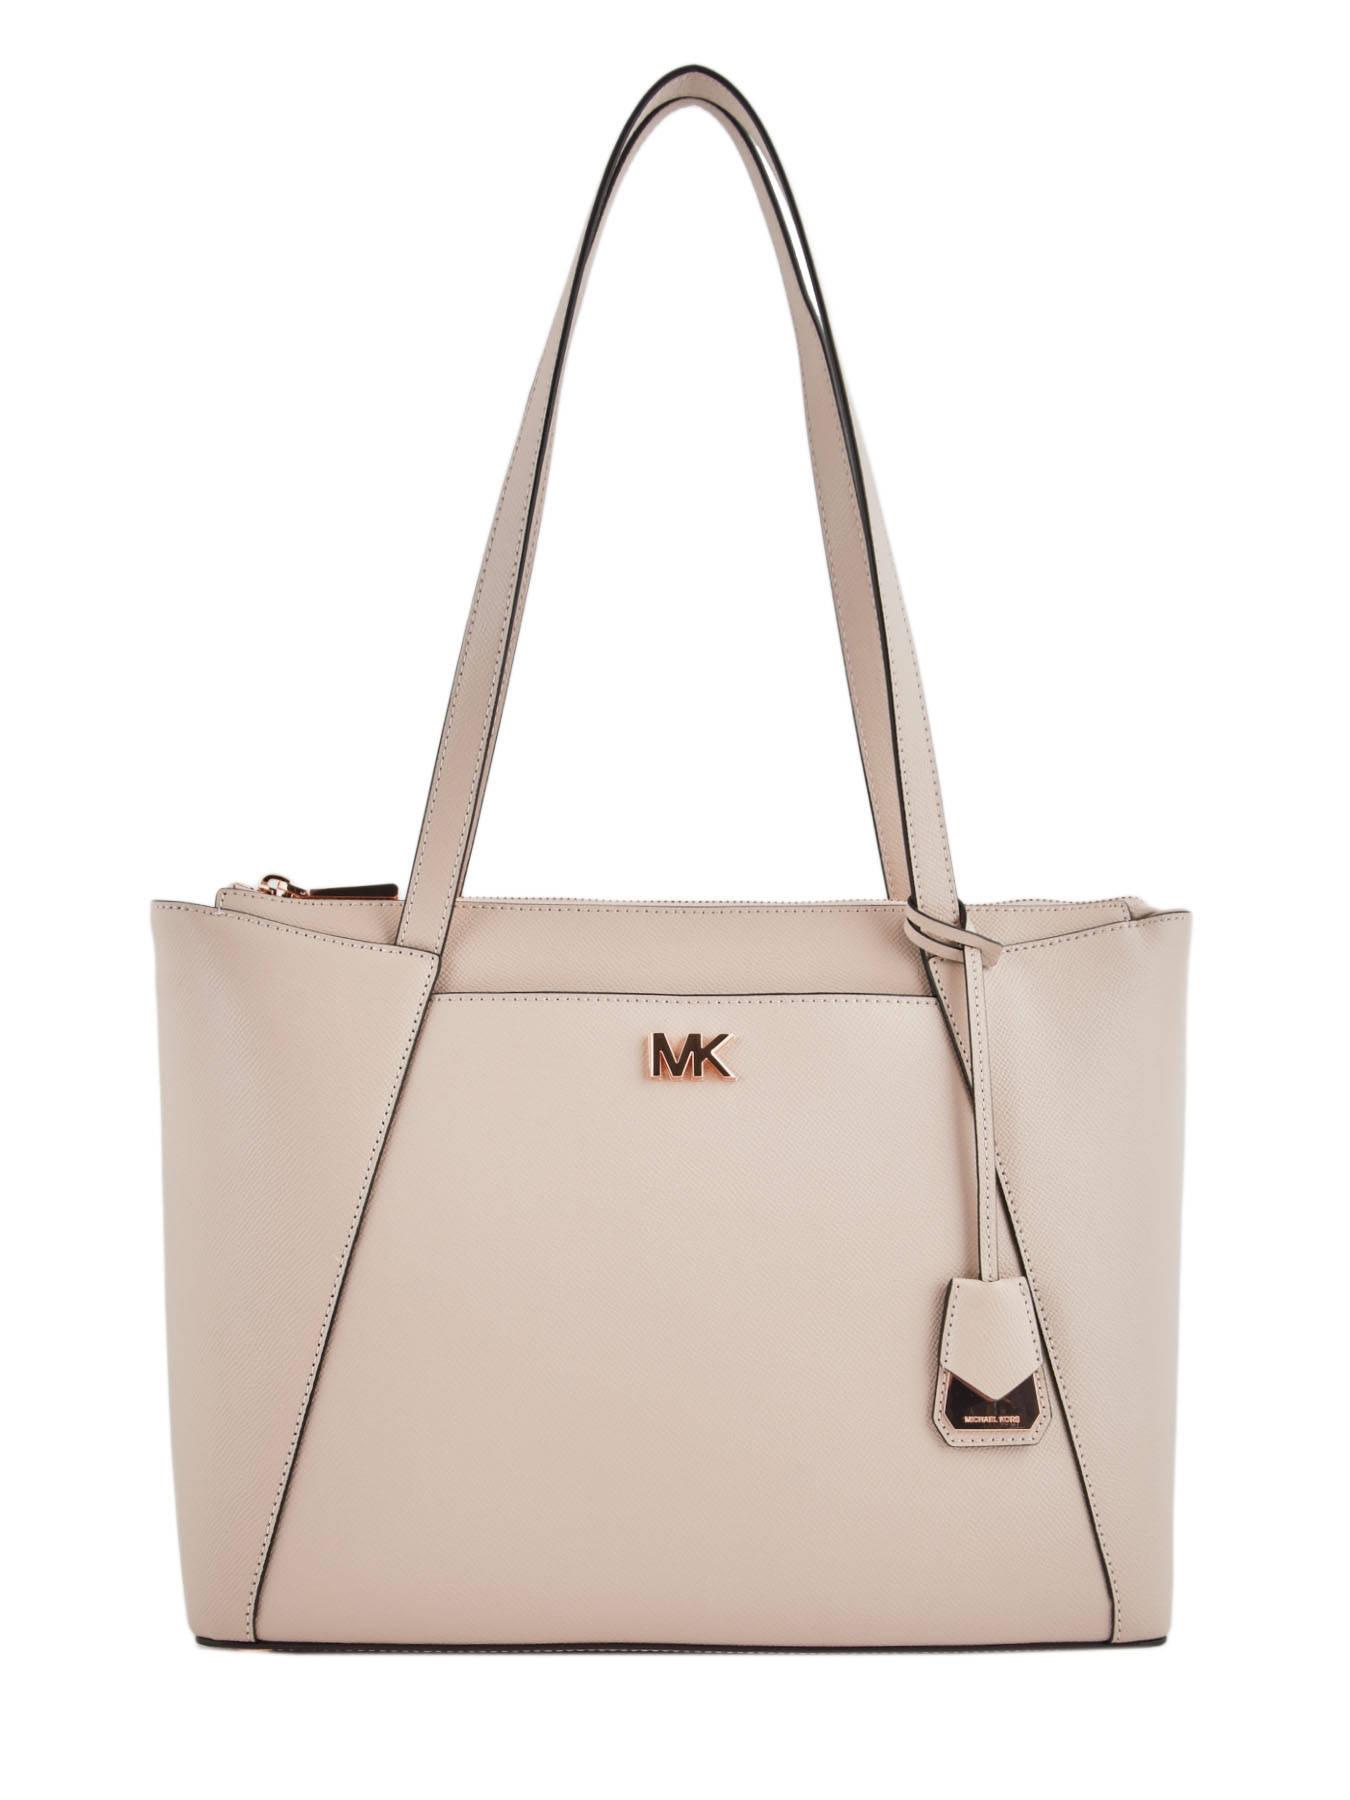 d6ca95df800d ... Shoulder Bag Maddie Leather Michael kors Pink maddie T8TN2T6L ...